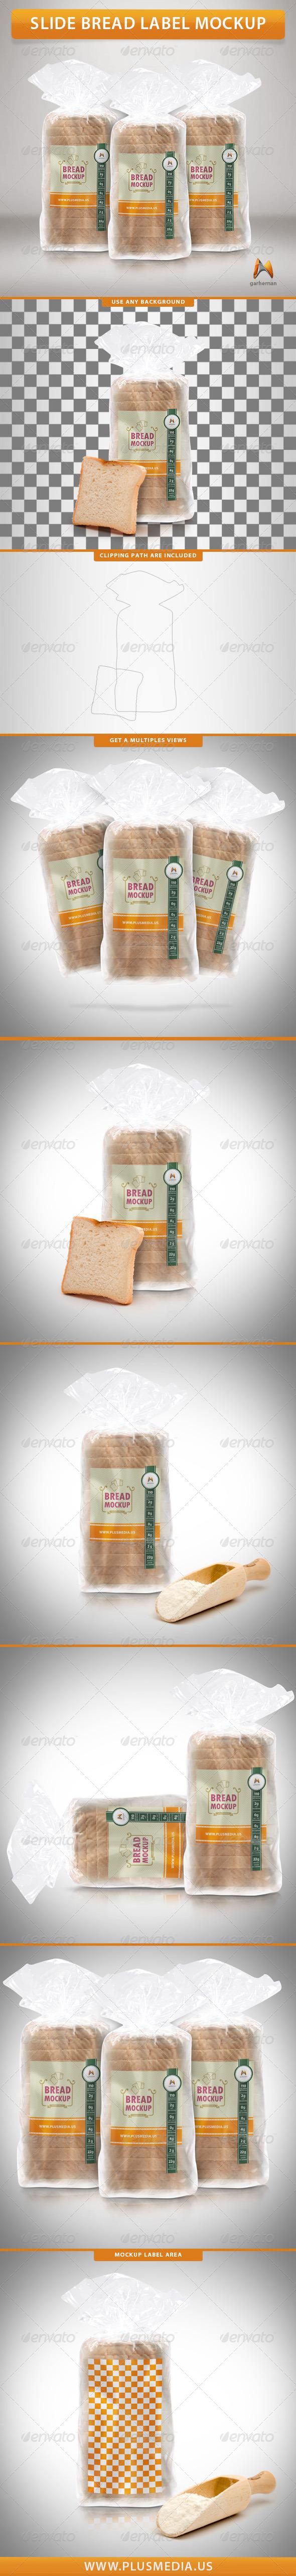 GraphicRiver Slide Bread Label Mockup 7815205